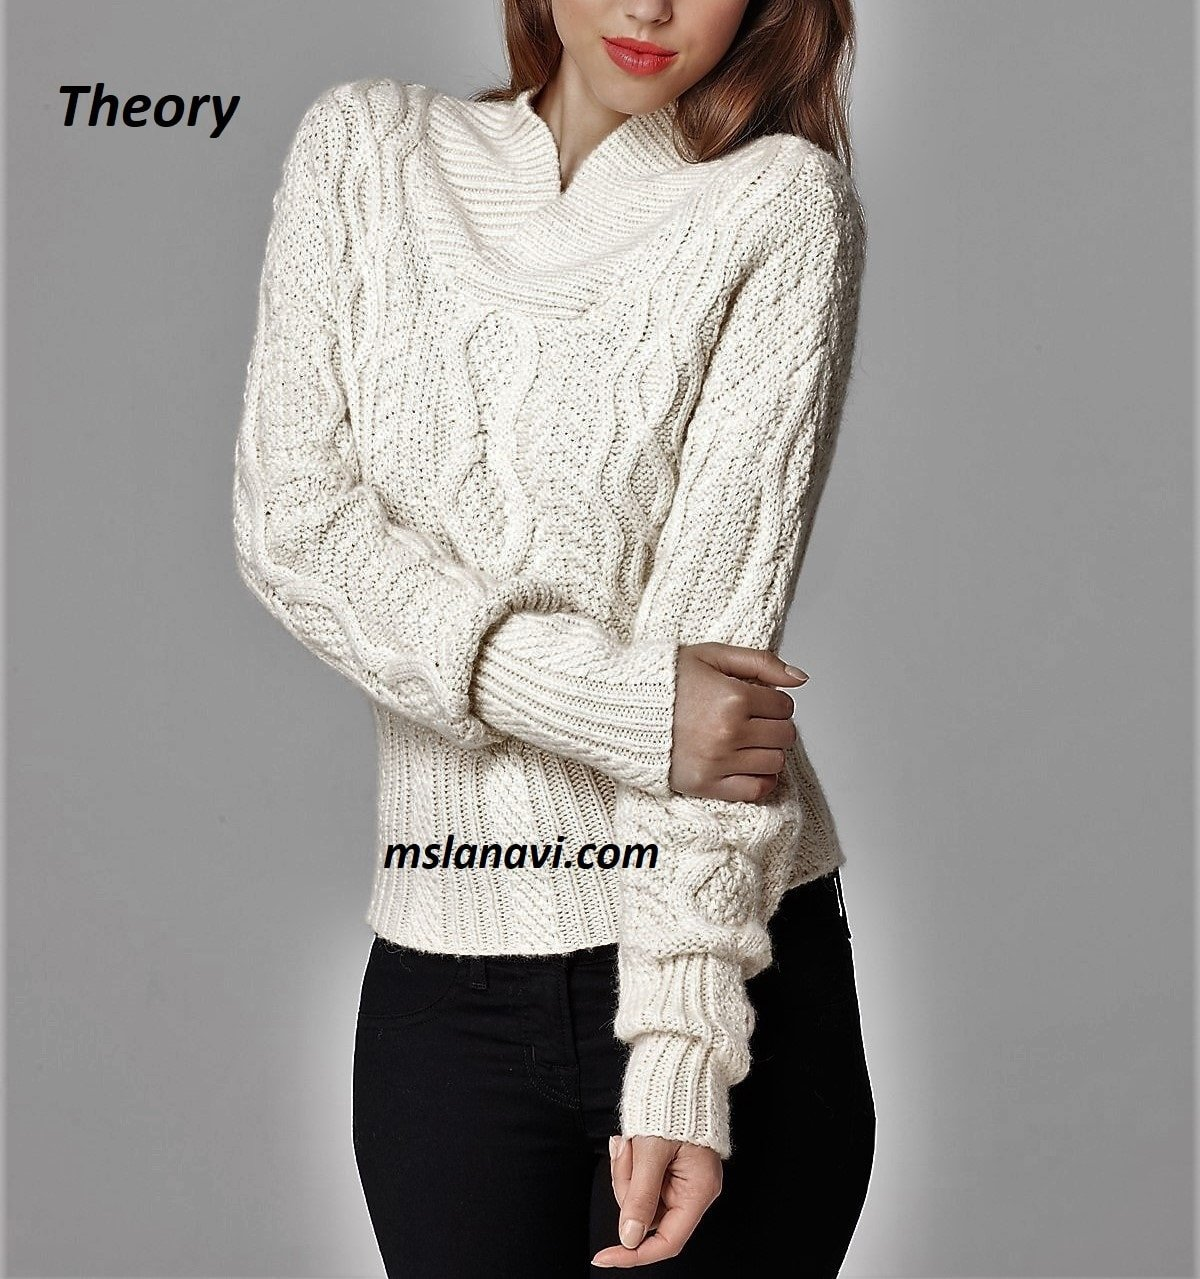 Романтичный свитер спицами от Theory